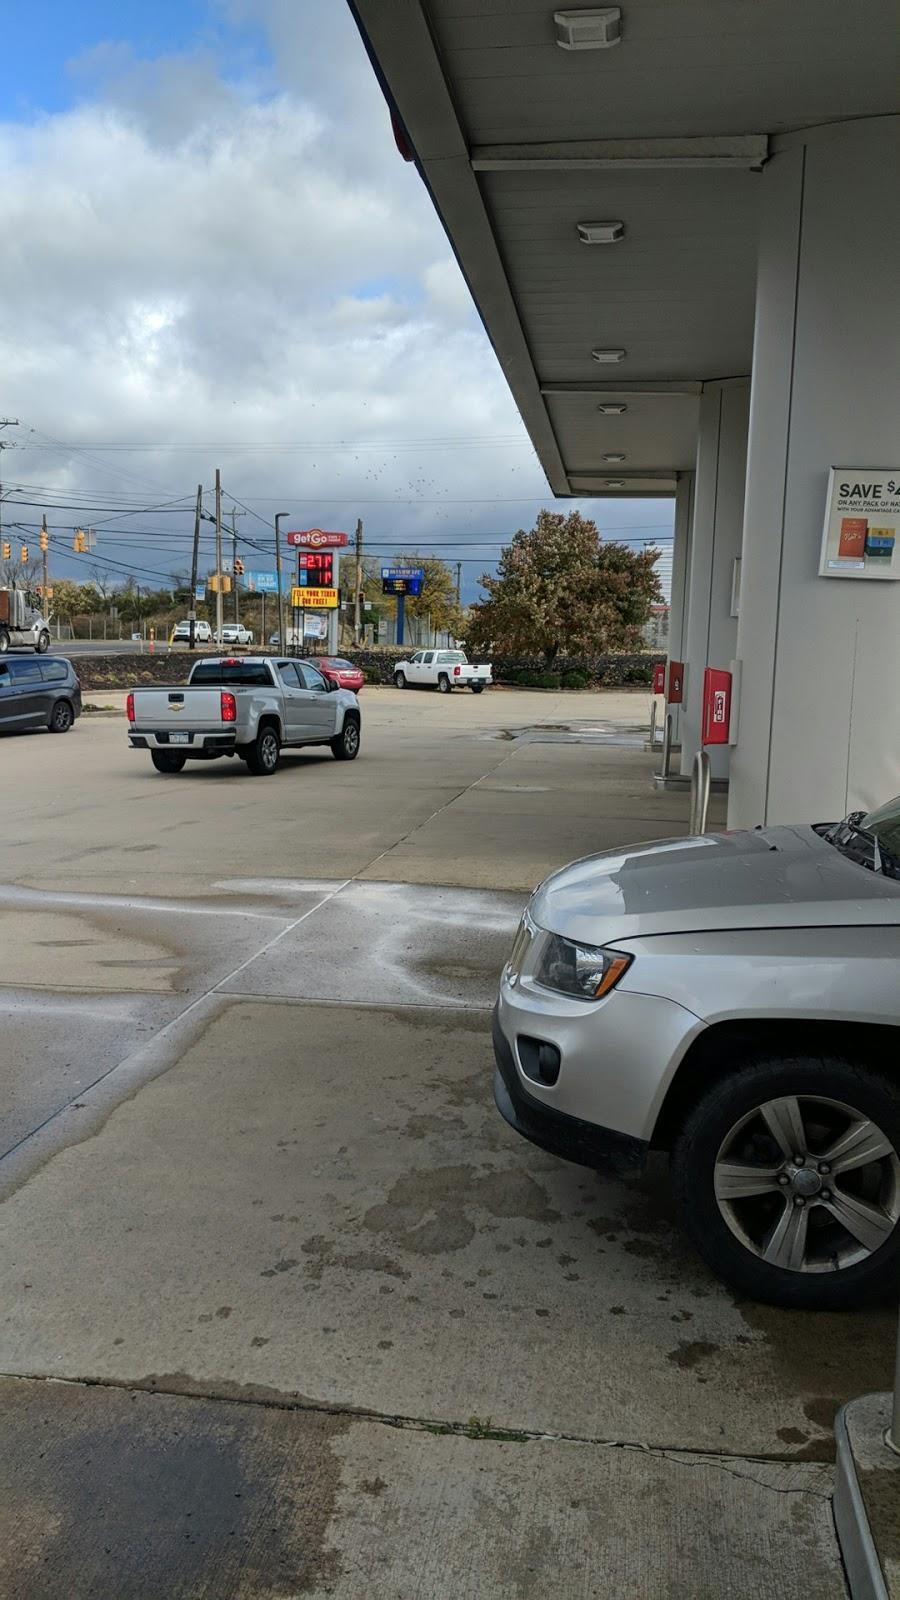 GetGo Gas Station & WetGo Car Wash - gas station    Photo 4 of 10   Address: 1001 Lebanon Rd, West Mifflin, PA 15122, USA   Phone: (412) 461-2114